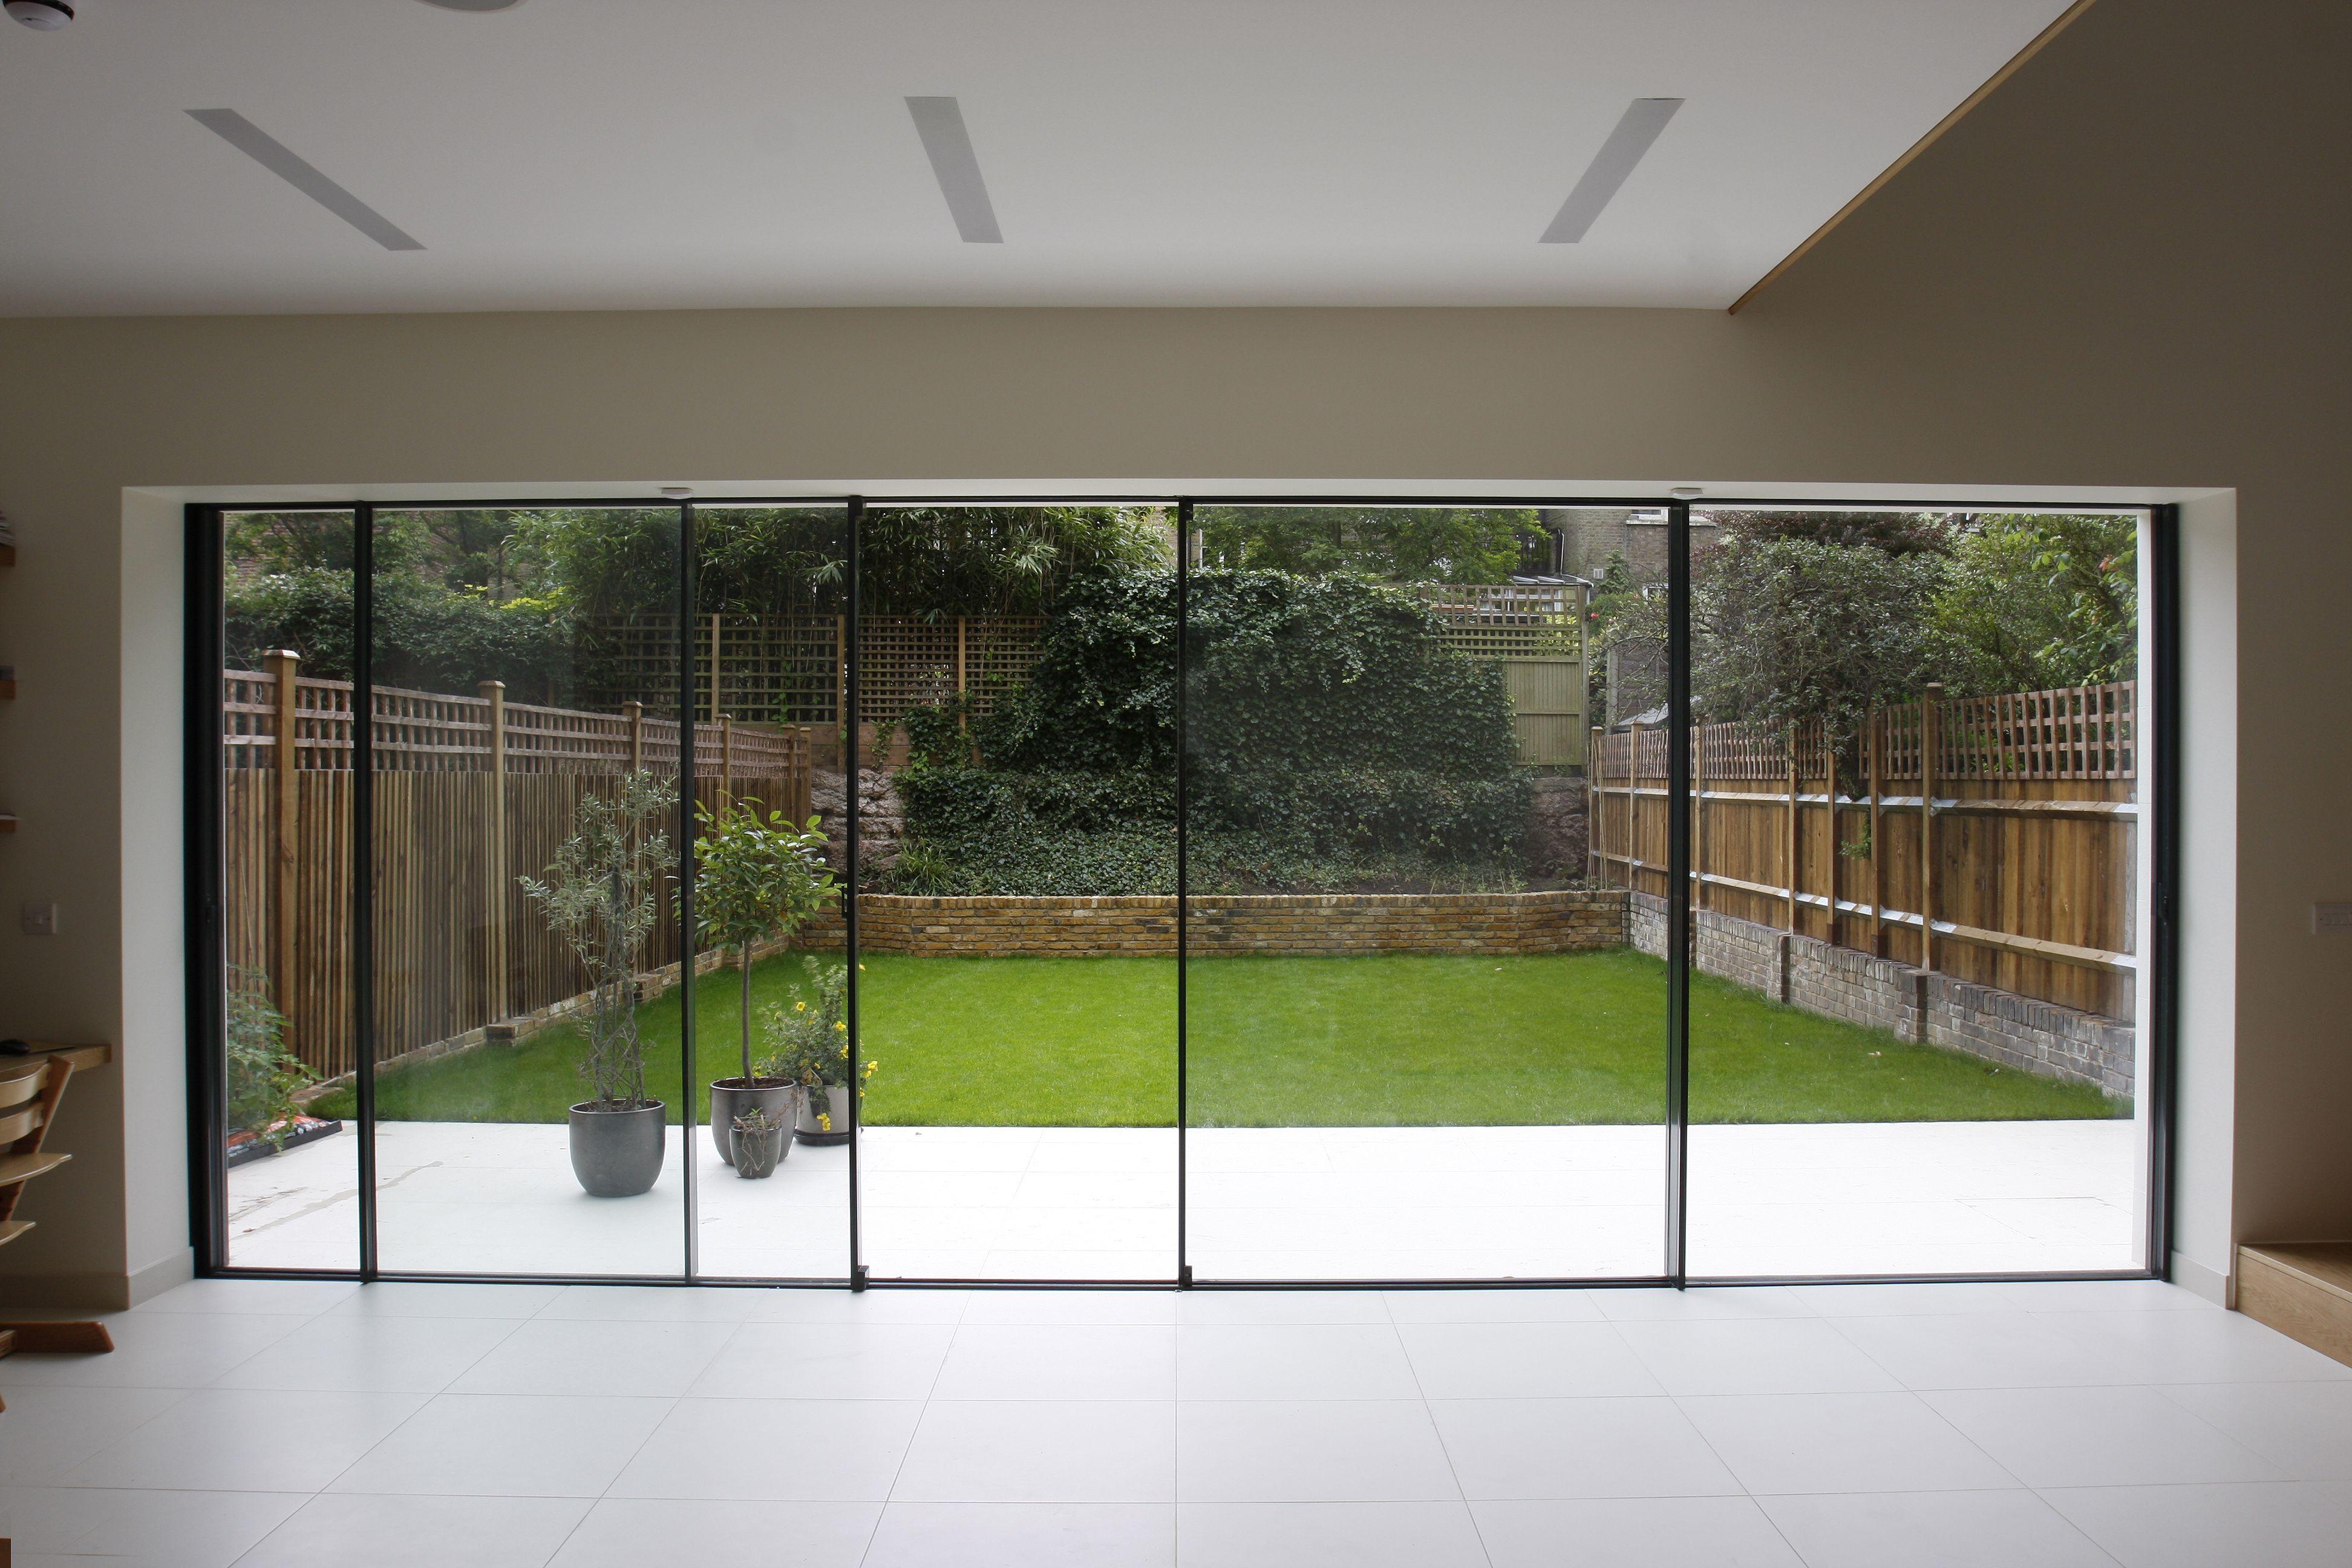 Best 25 Bifold glass doors ideas on Pinterest  Folding